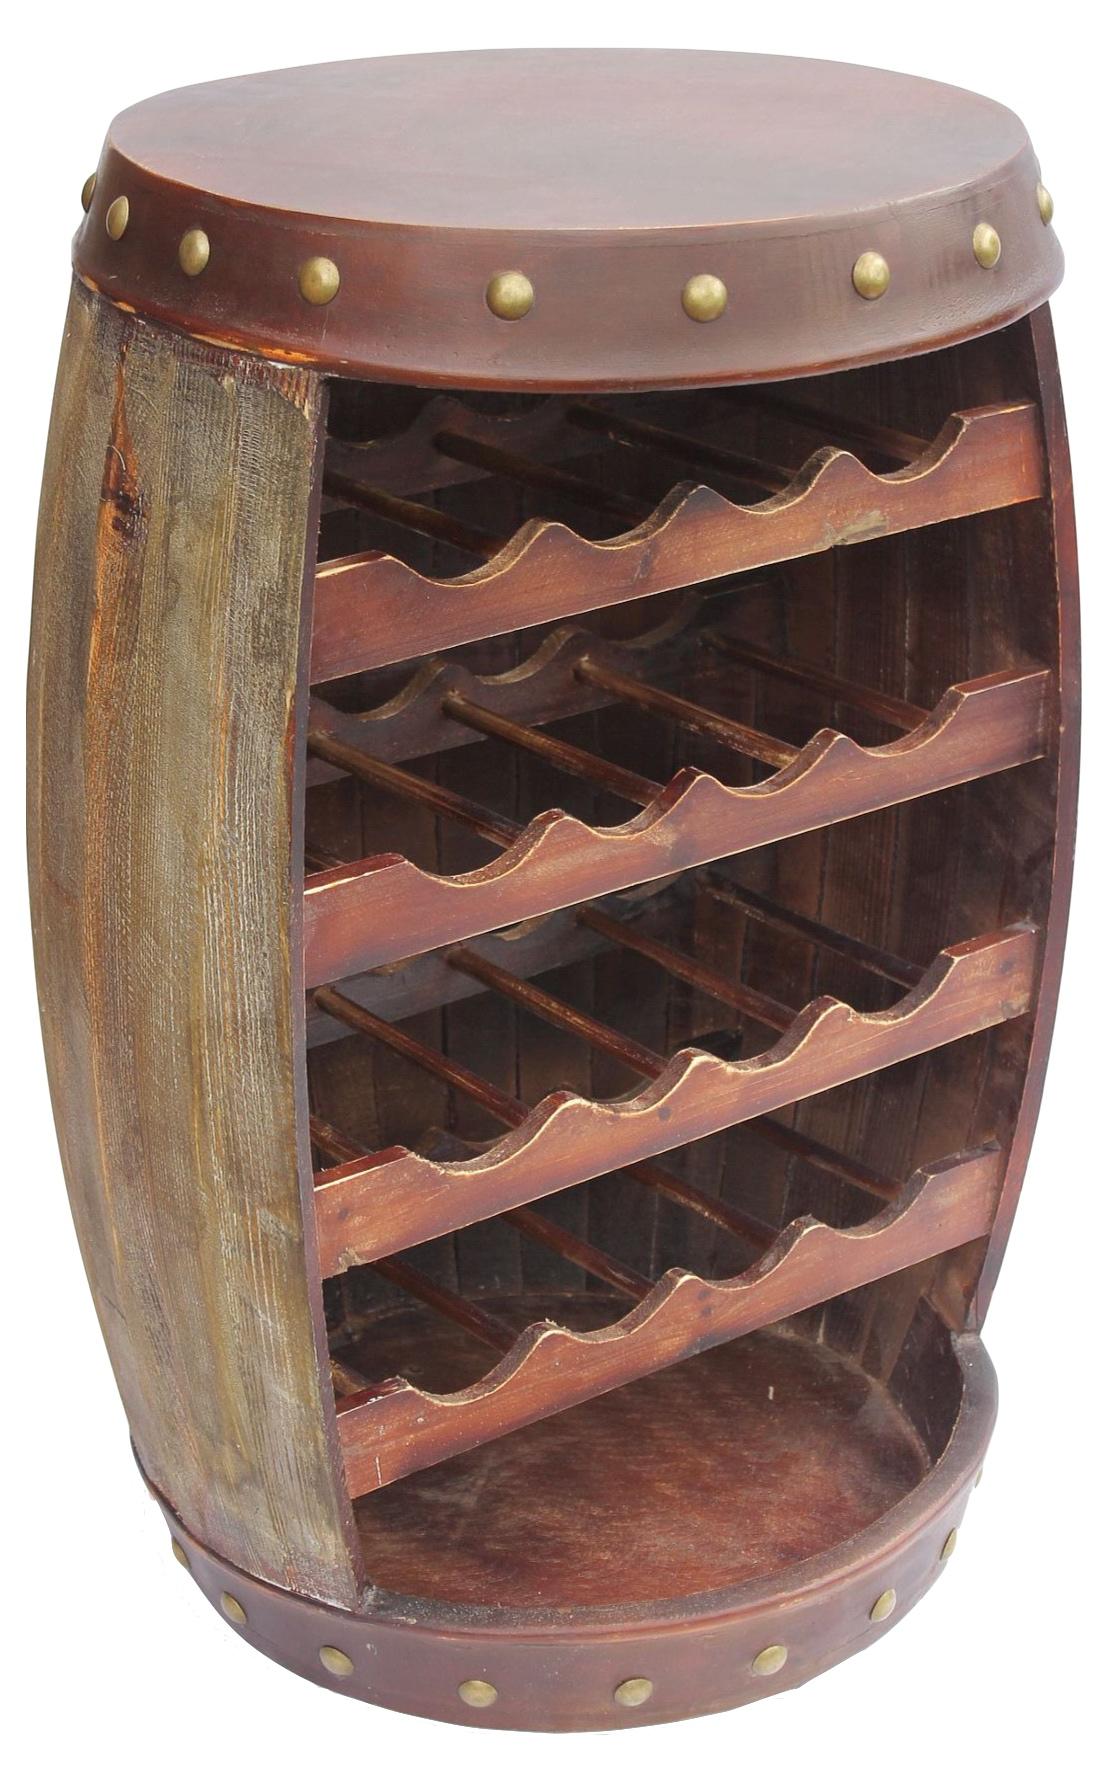 weinregal weinfass 1546 fass aus holz 70cm flaschenst nder. Black Bedroom Furniture Sets. Home Design Ideas